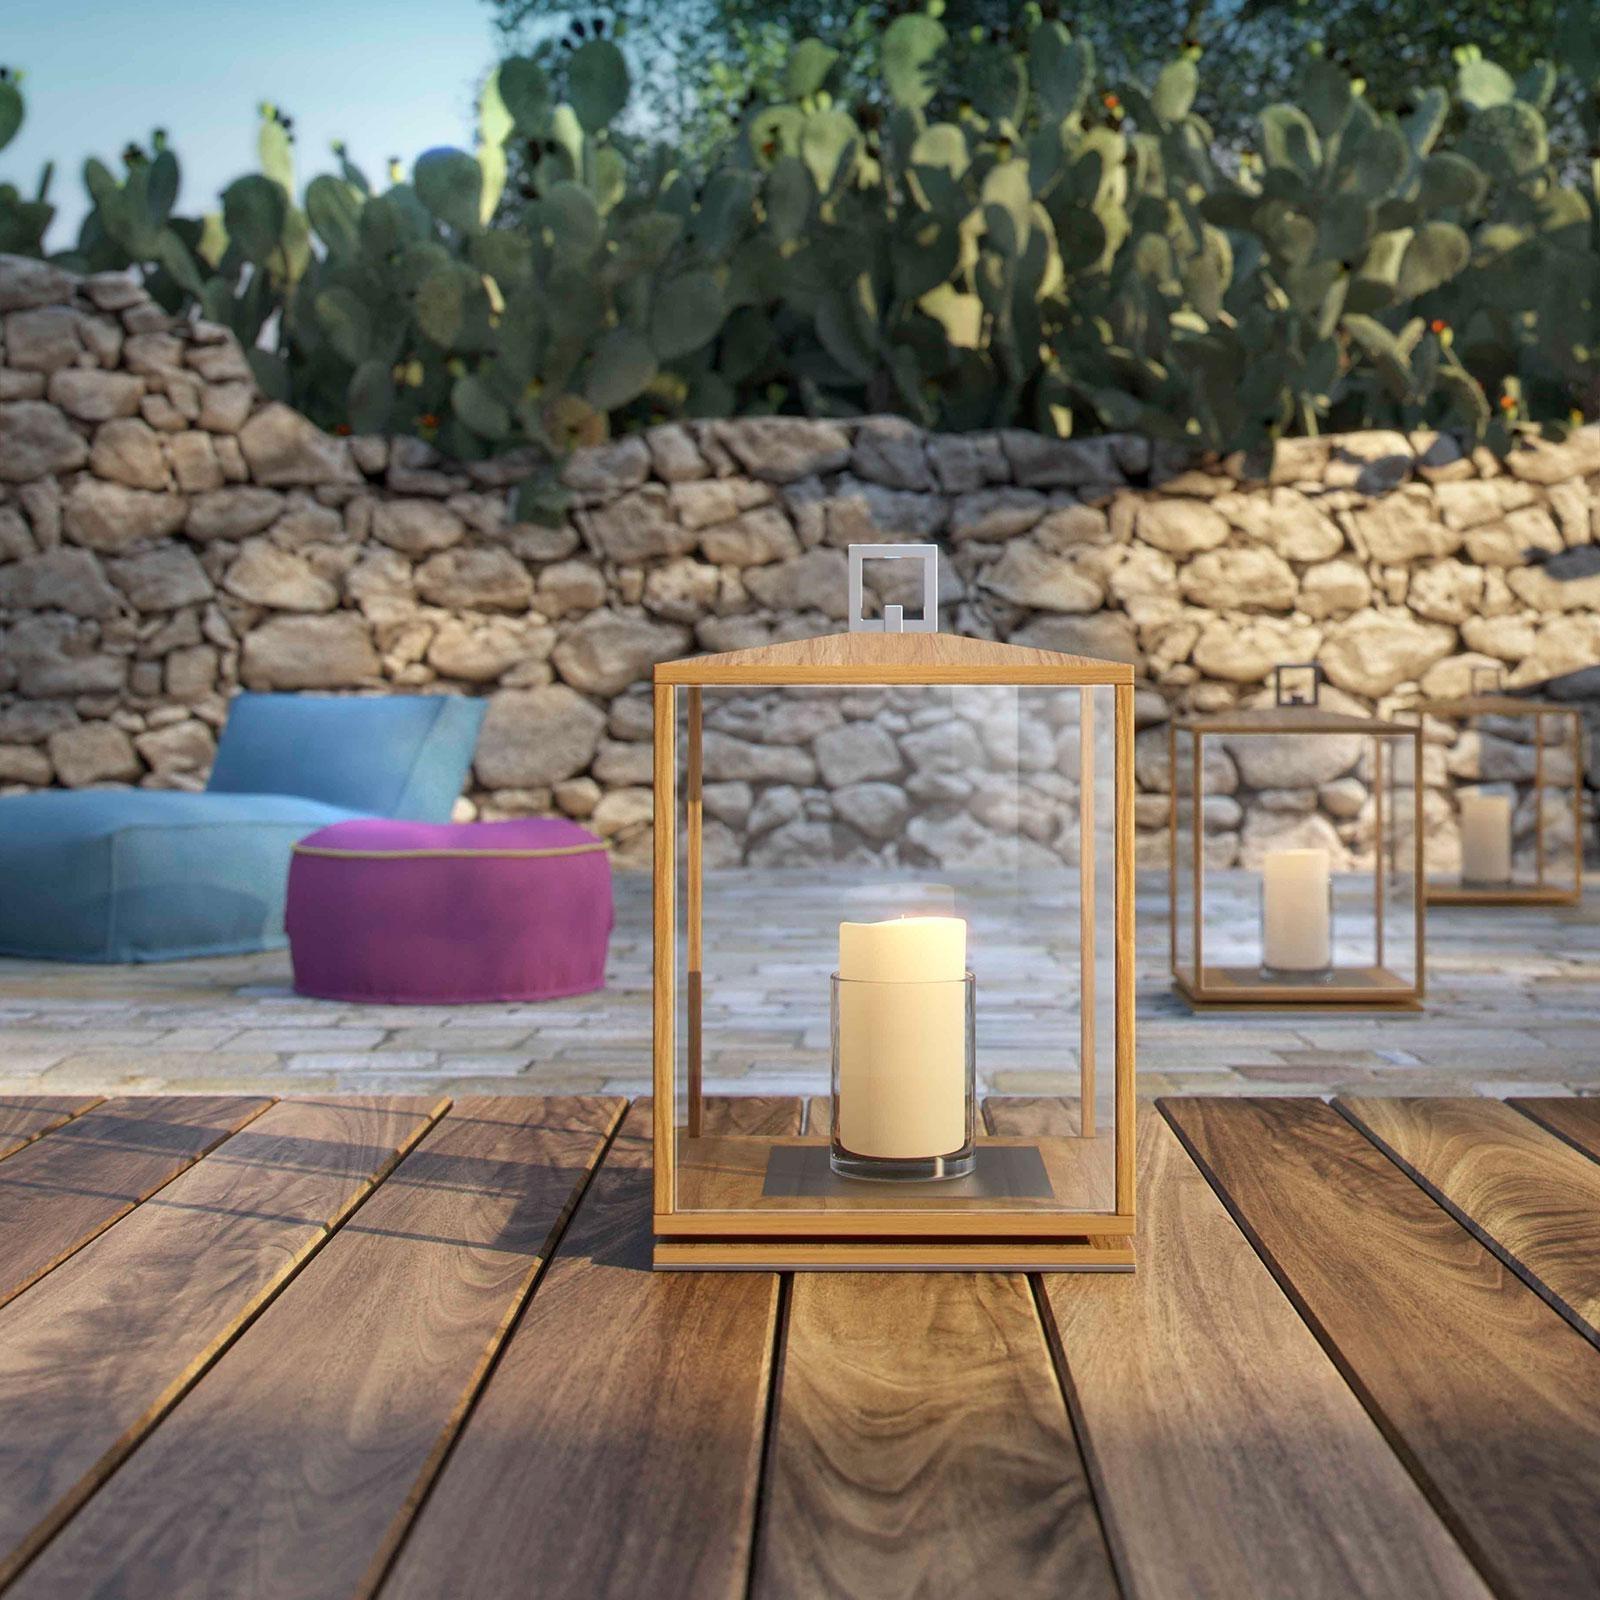 Best And Newest Cubico Outdoor Teak Lantern – Idd For Outdoor Teak Lanterns (Gallery 20 of 20)